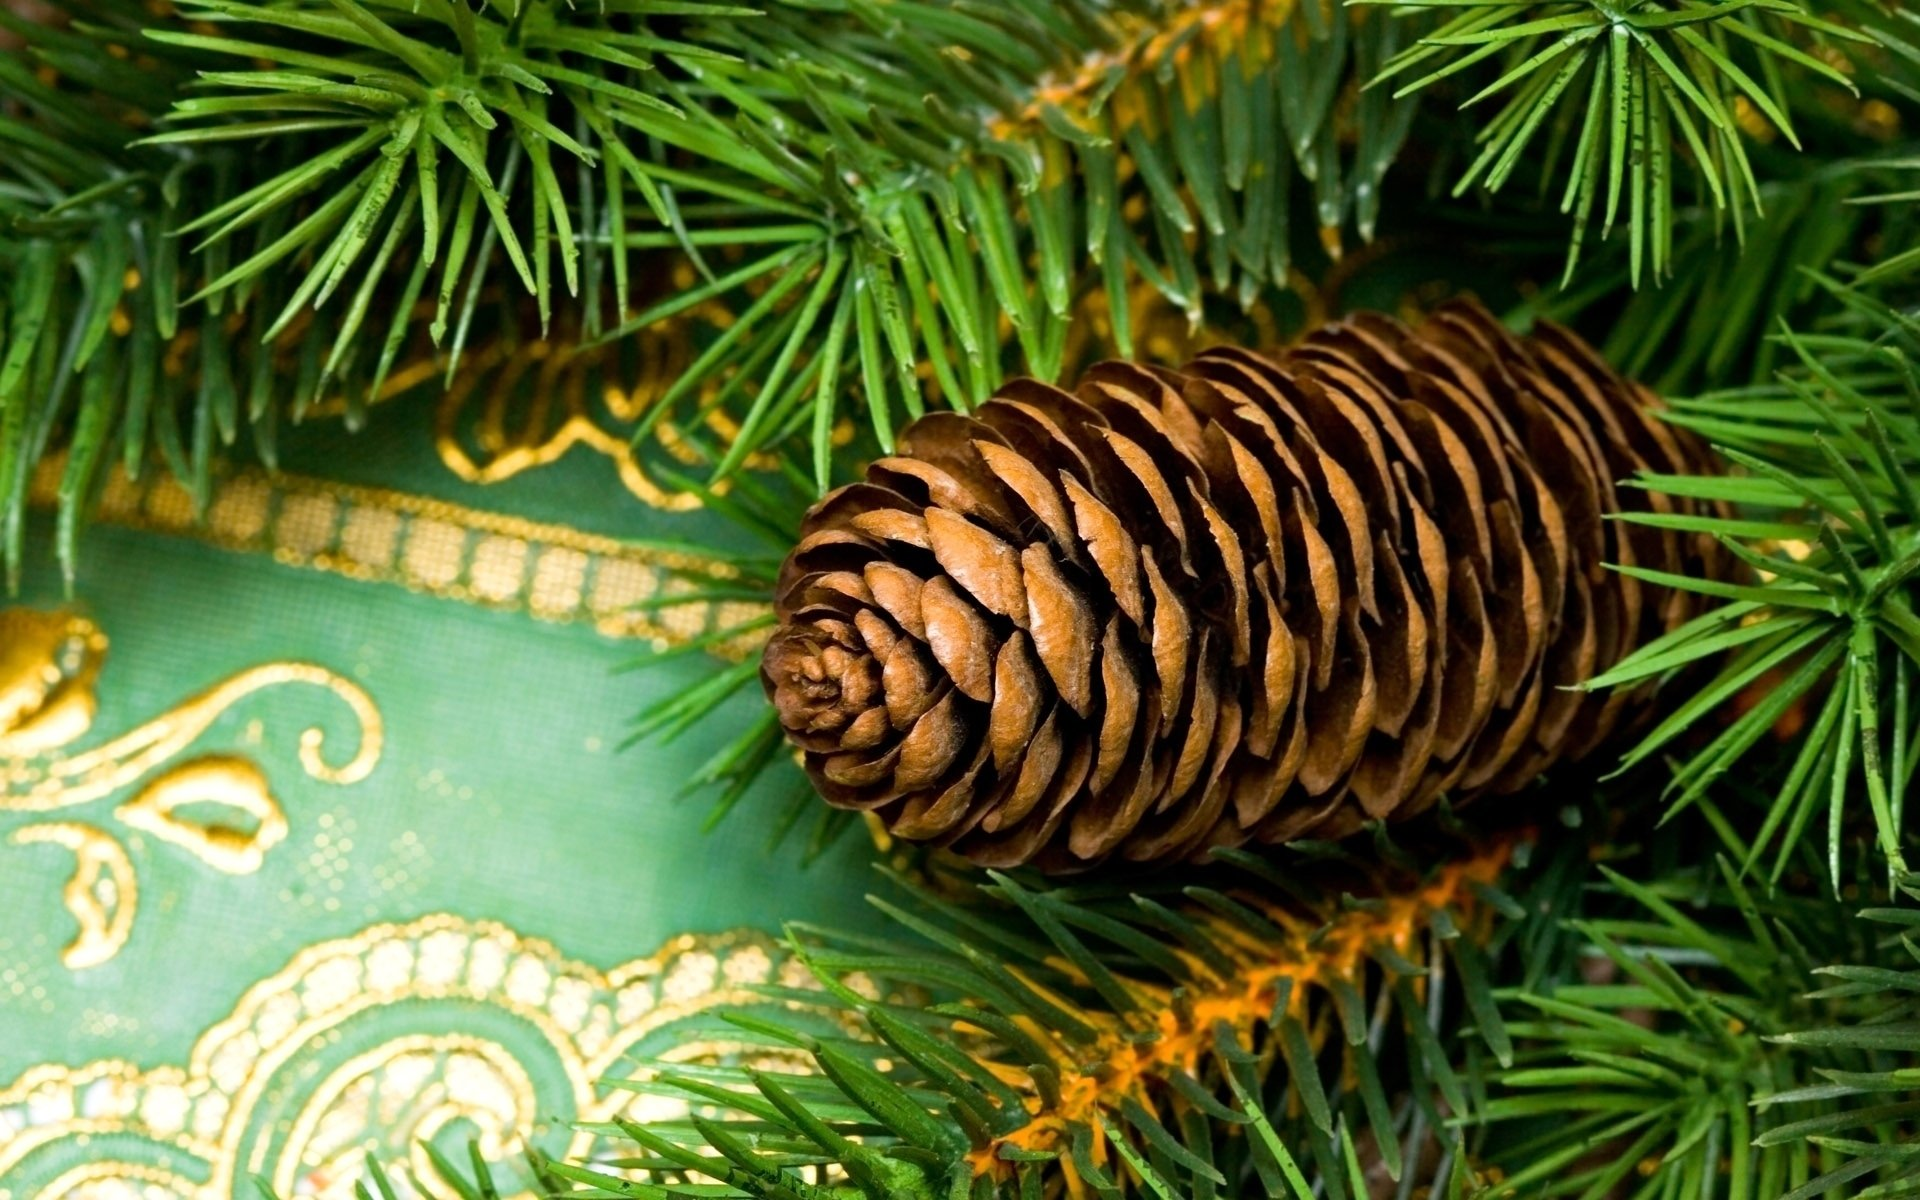 节日 - 圣诞节  Decoration Pine Cone 壁纸